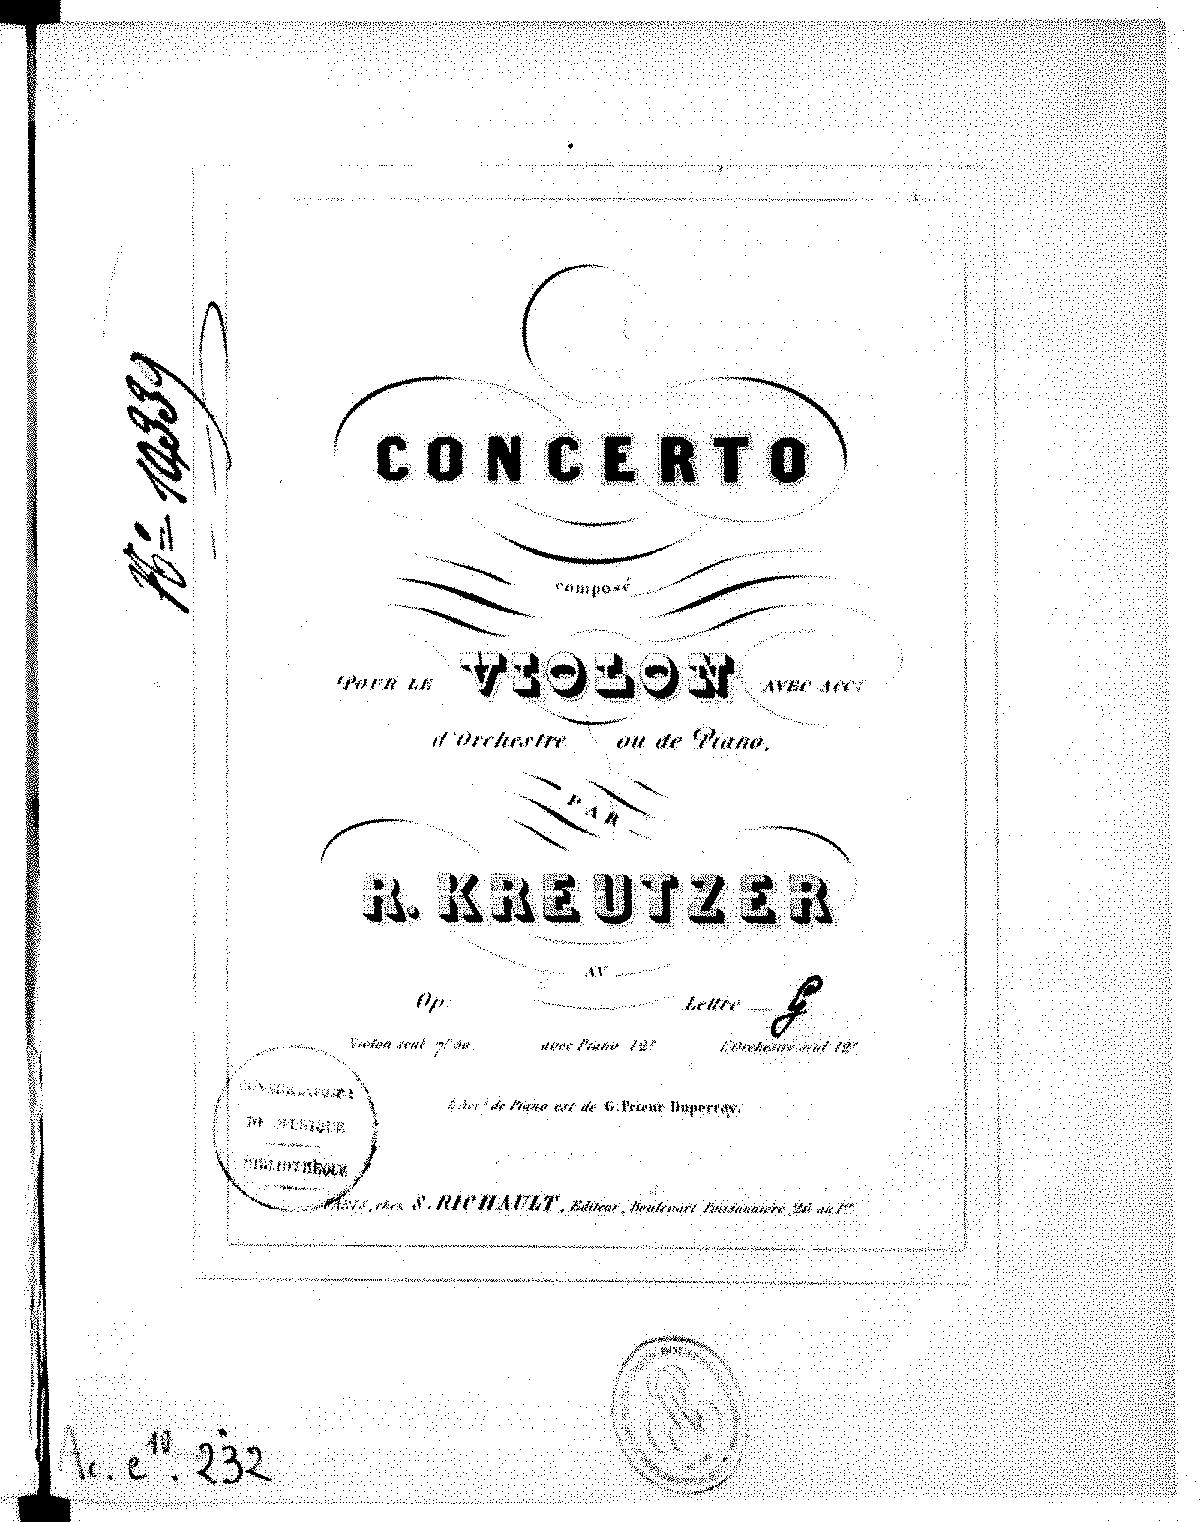 Violin Concerto No.19 in D minor (Kreutzer, Rodolphe